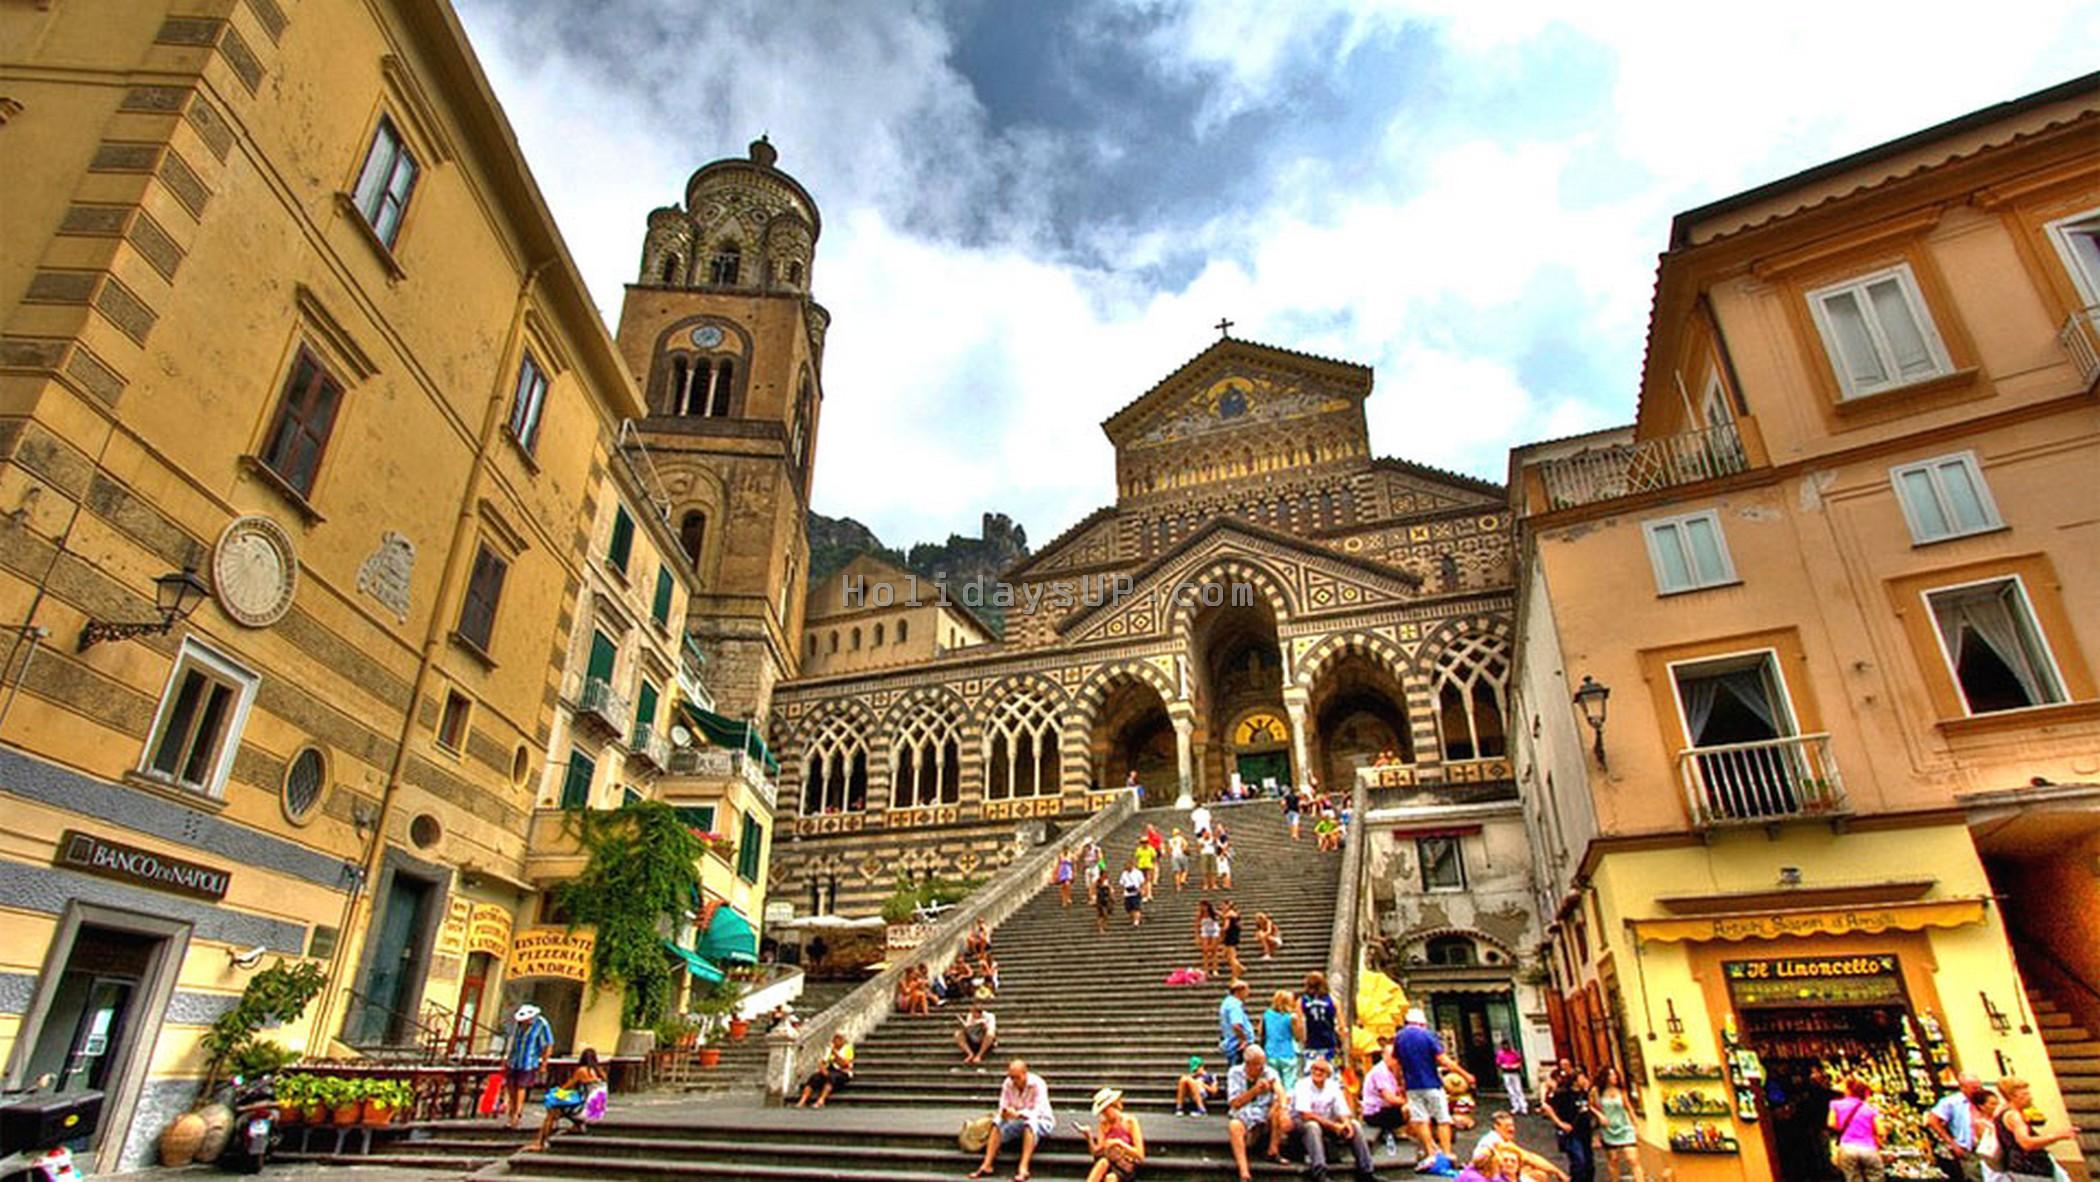 Duomo Amalfi - Amalfi